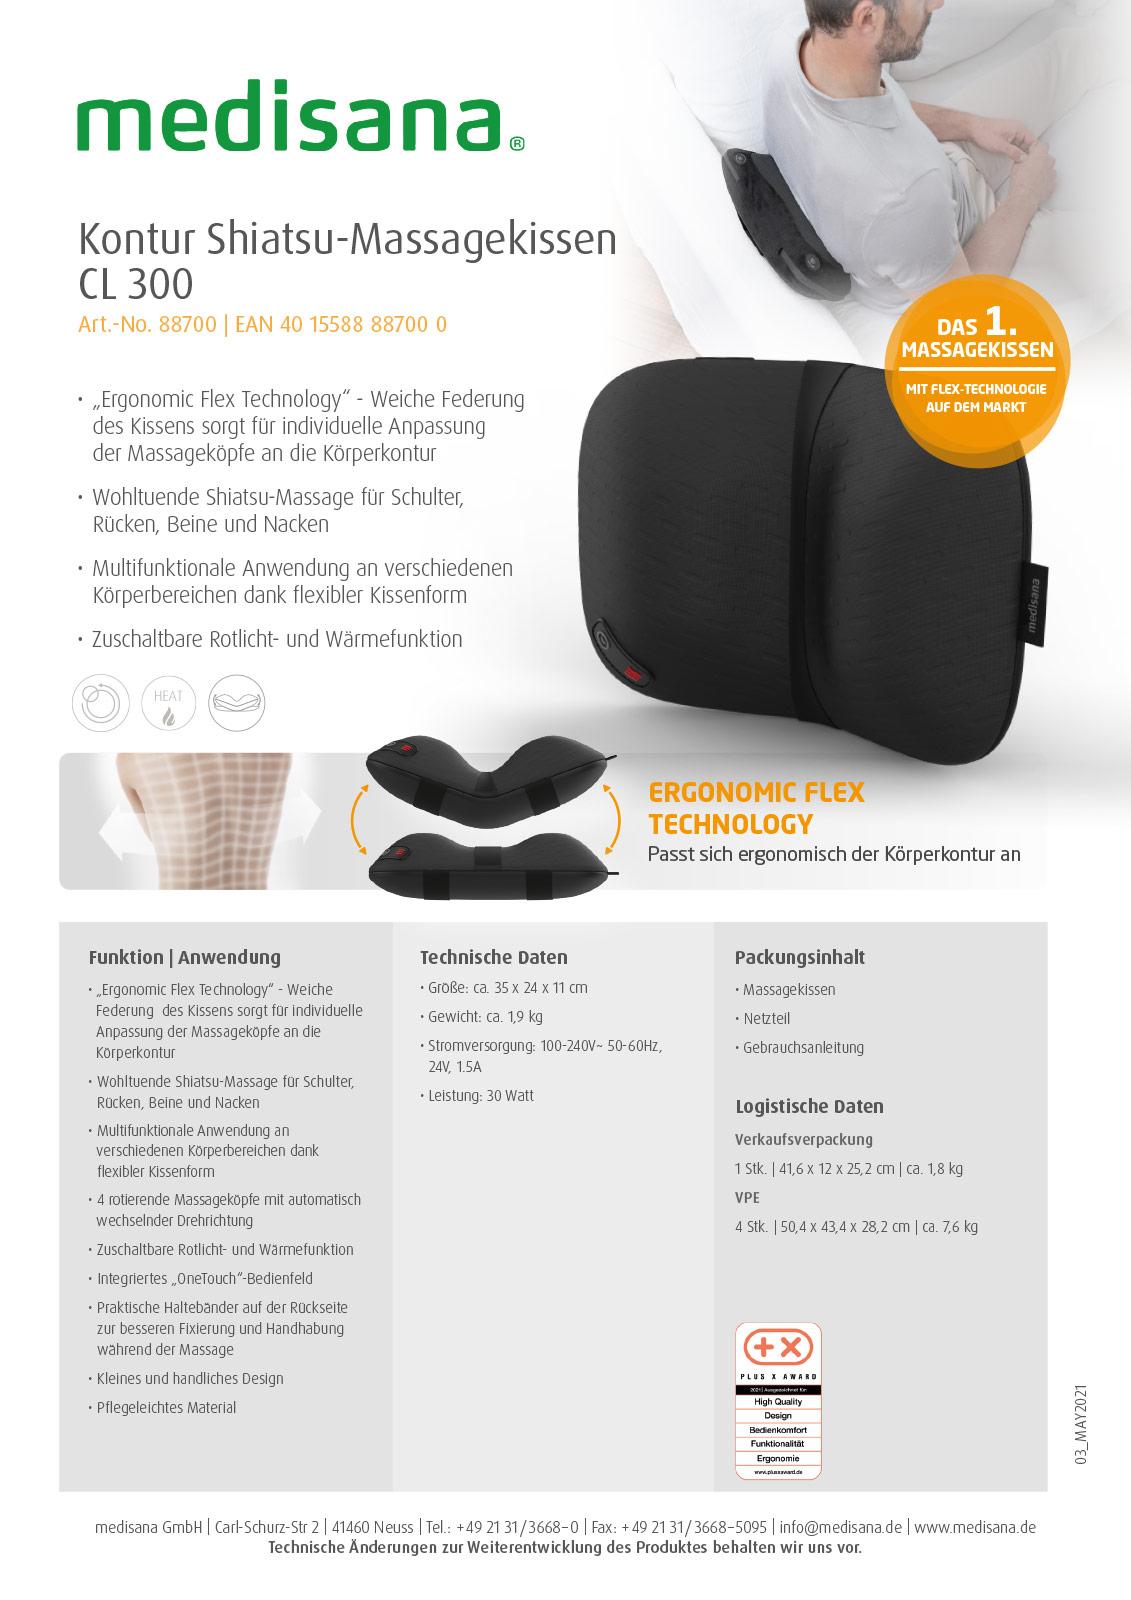 "Kontur Shiatsu-Massagekissen CL 300 mit innovativer ""Ergonomic Flex Technology"" Produktblatt"